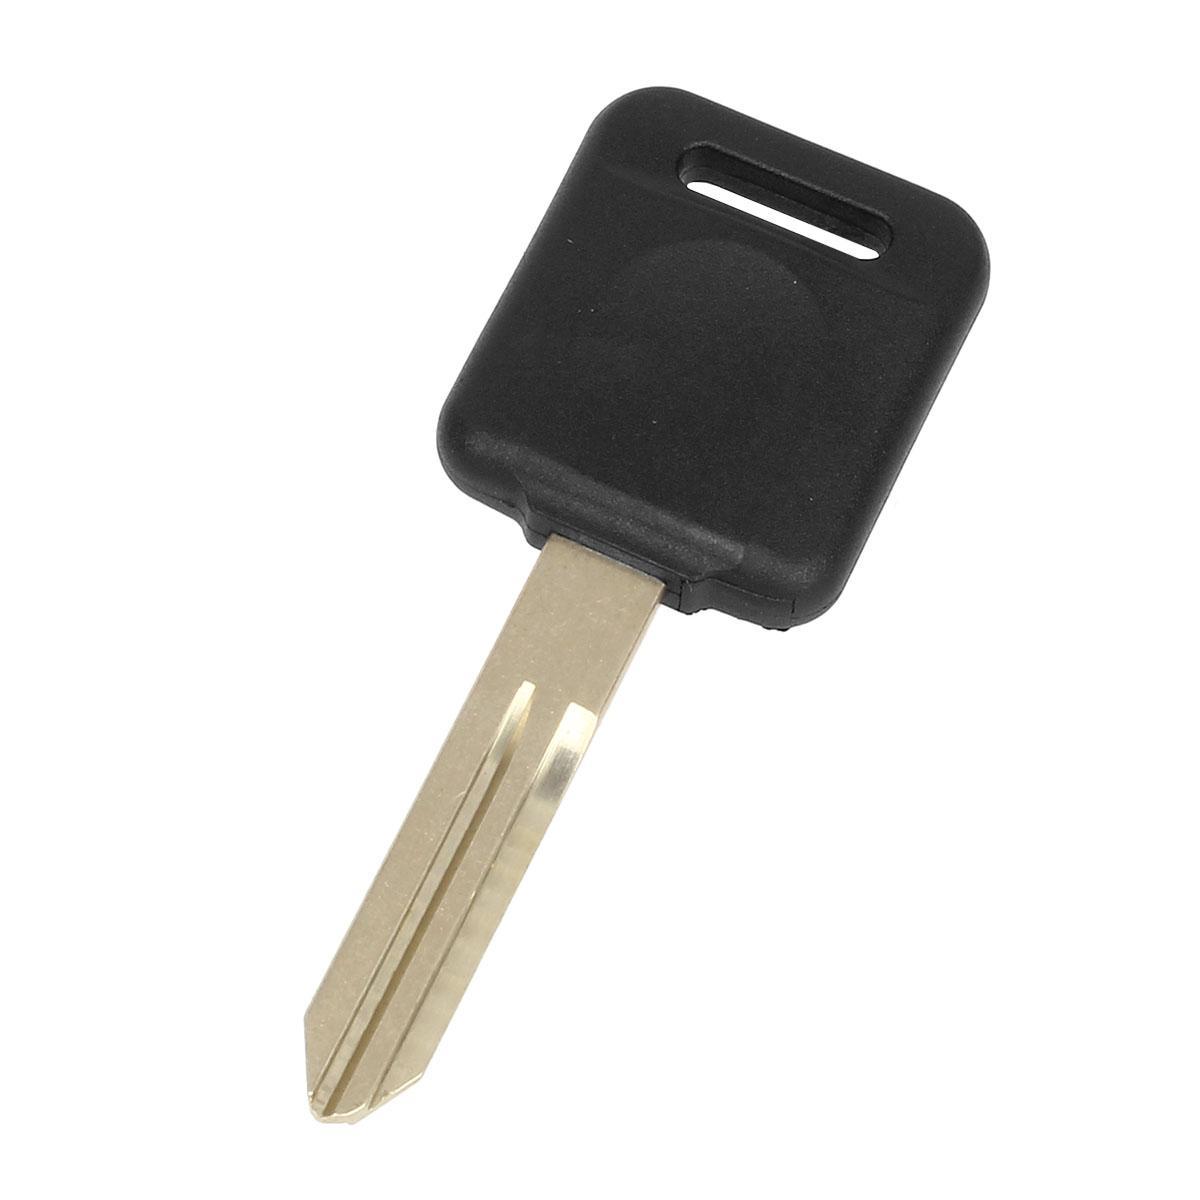 New Keyless Entry Remote Fob & Uncut Chip Transponder ...